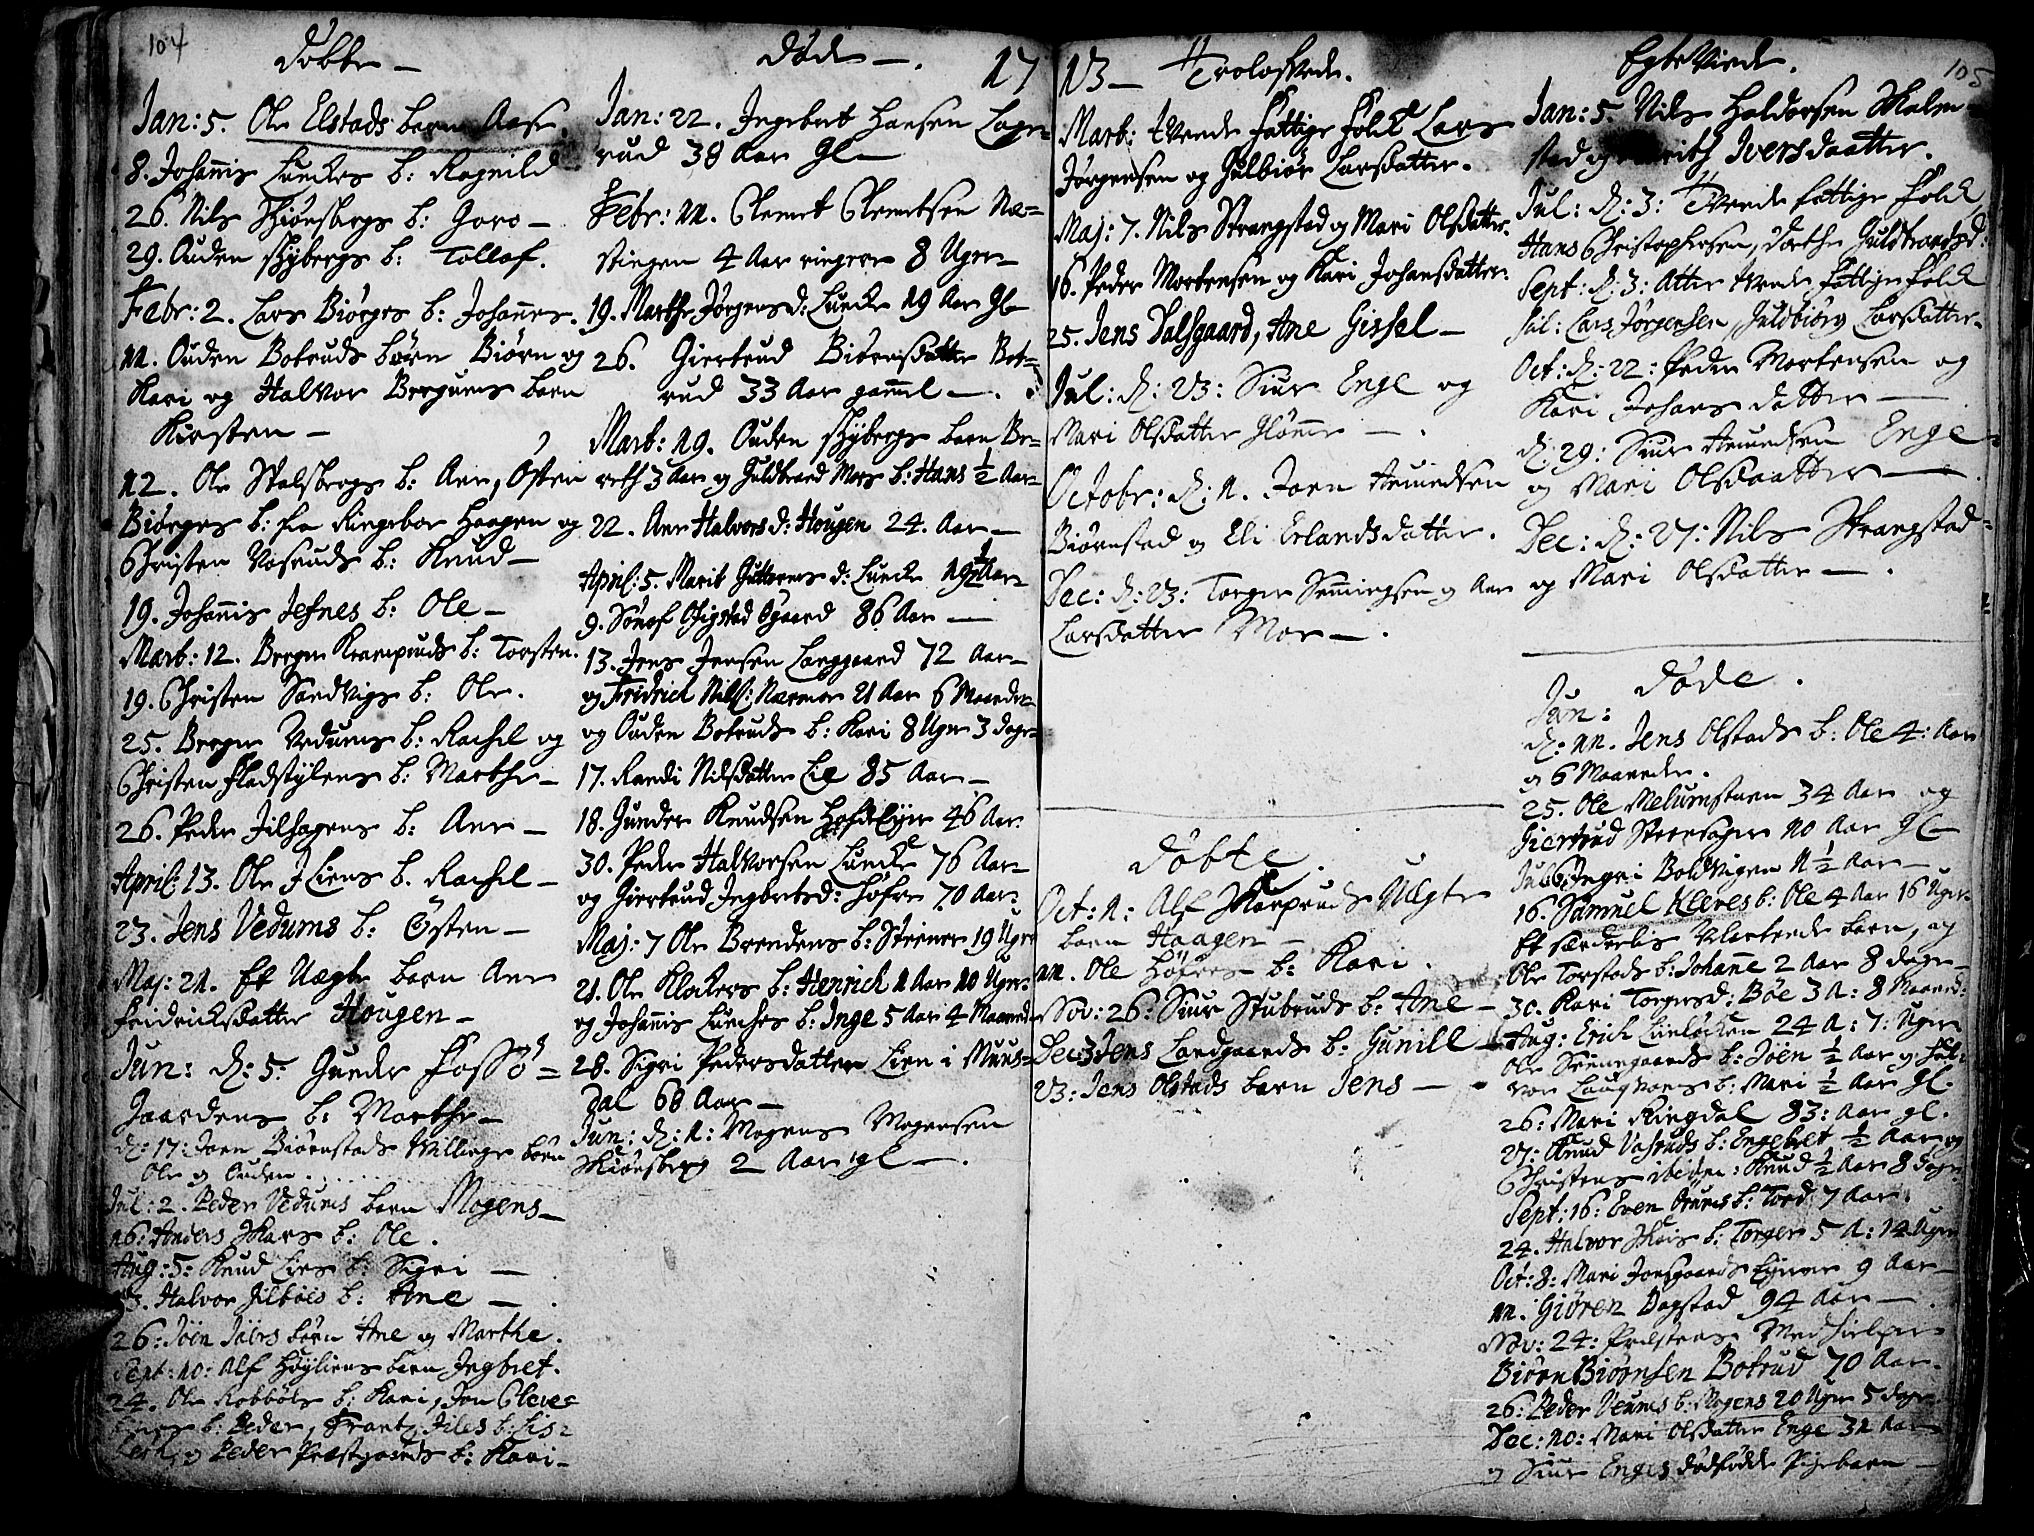 SAH, Øyer prestekontor, Ministerialbok nr. 1, 1671-1727, s. 104-105